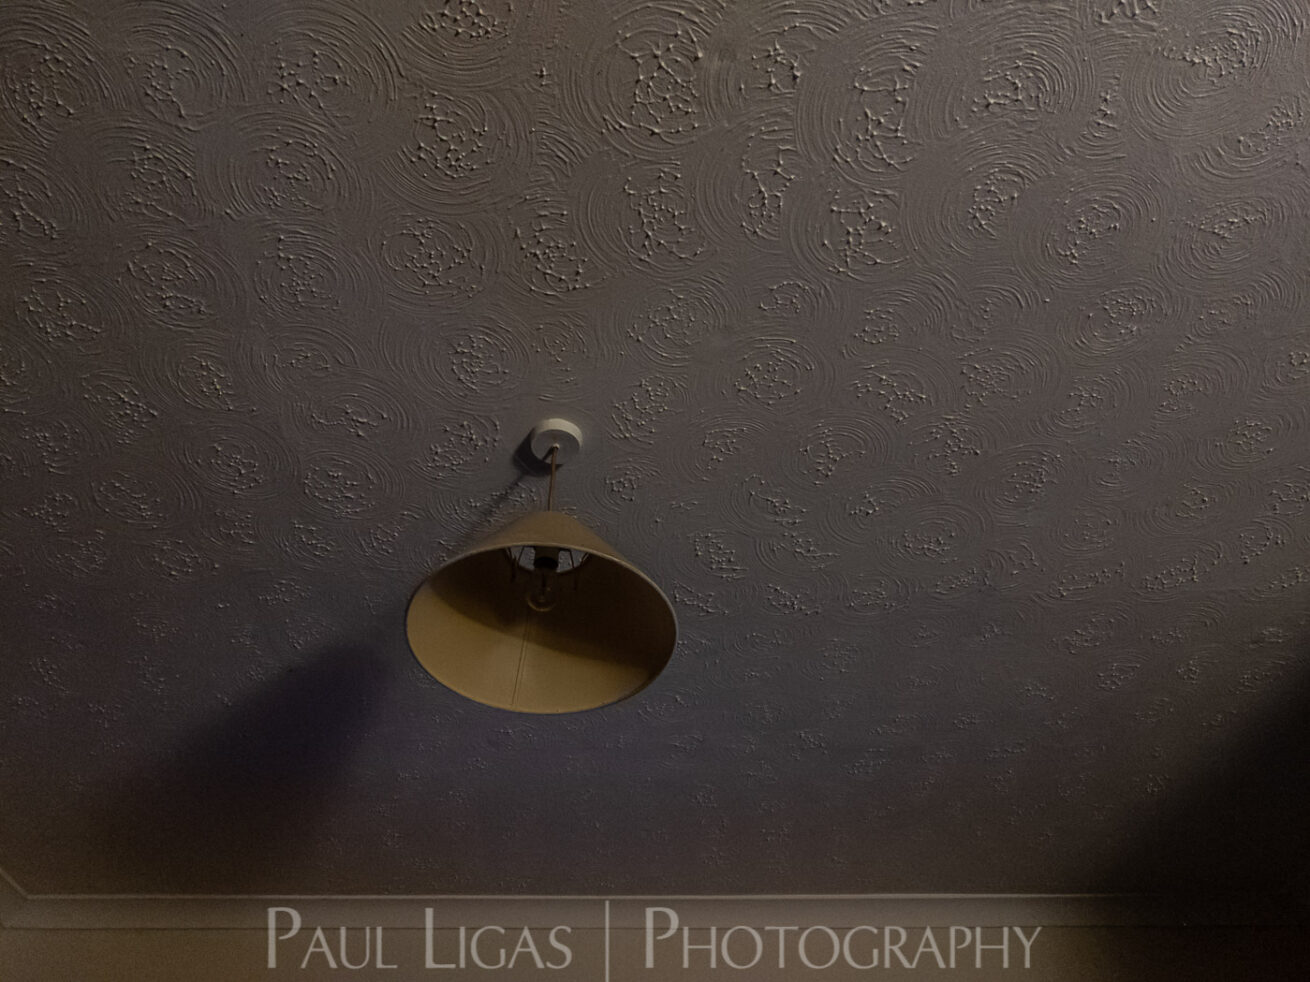 photos from inside a lockdown 2 part 2 paul ligas photography hereford ledbury – 5810